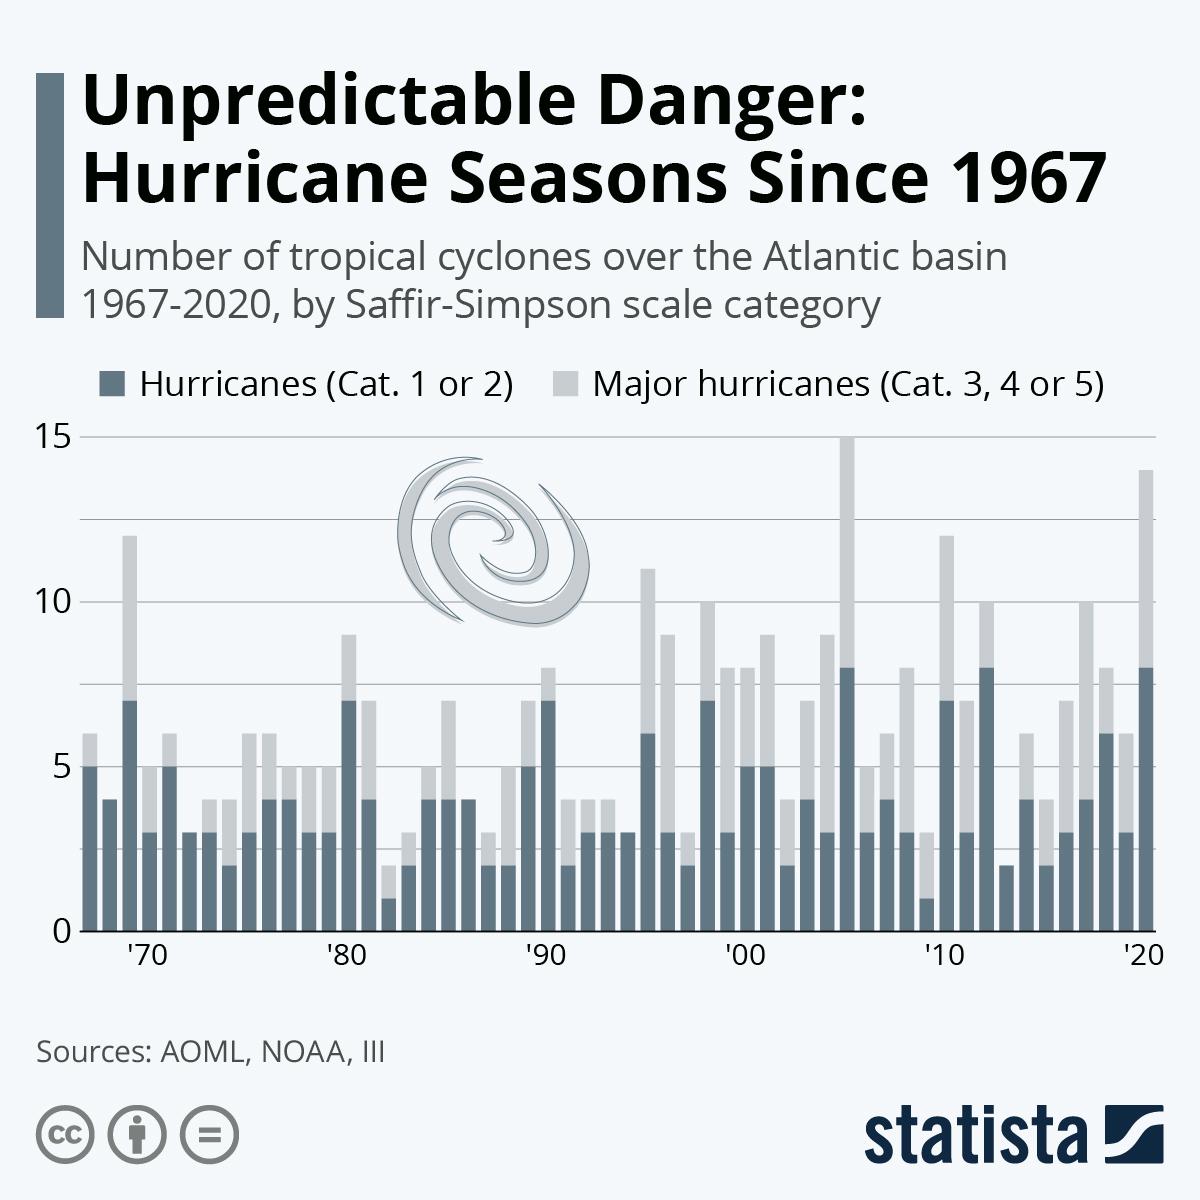 Unpredictable Danger: Hurricane Seasons Since 1967